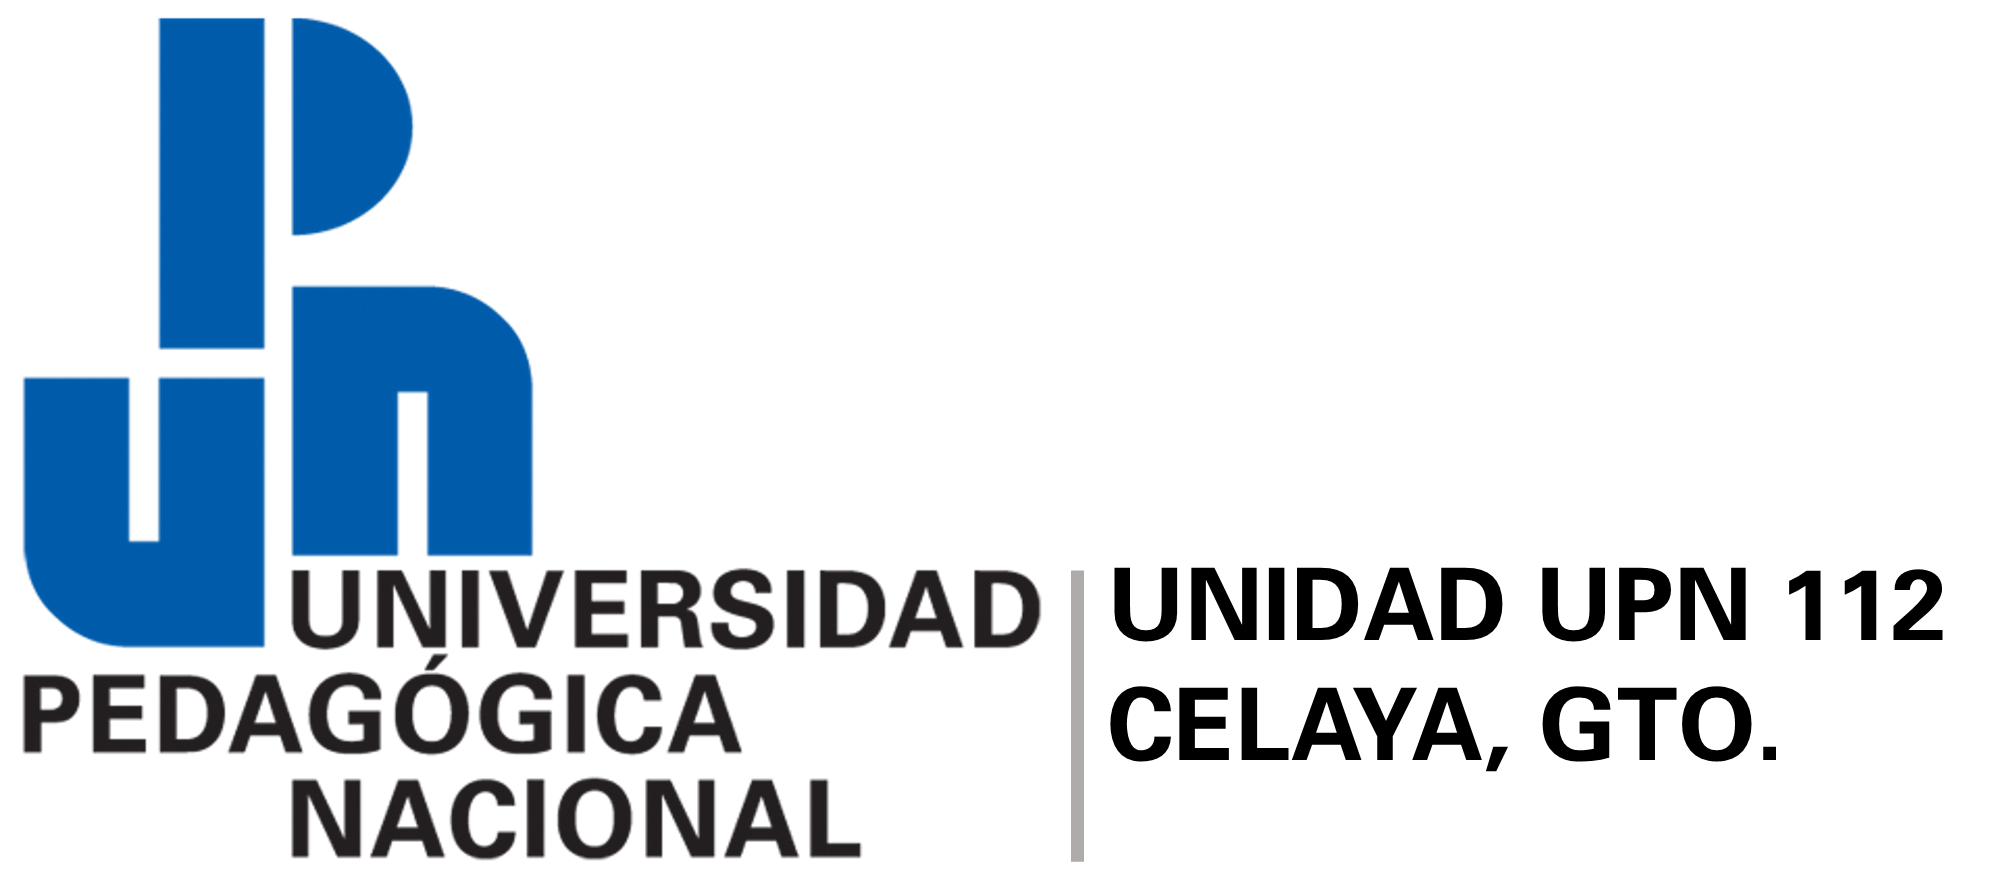 UNIVERSIDAD PEDAGÓGICA NACIONAL 112